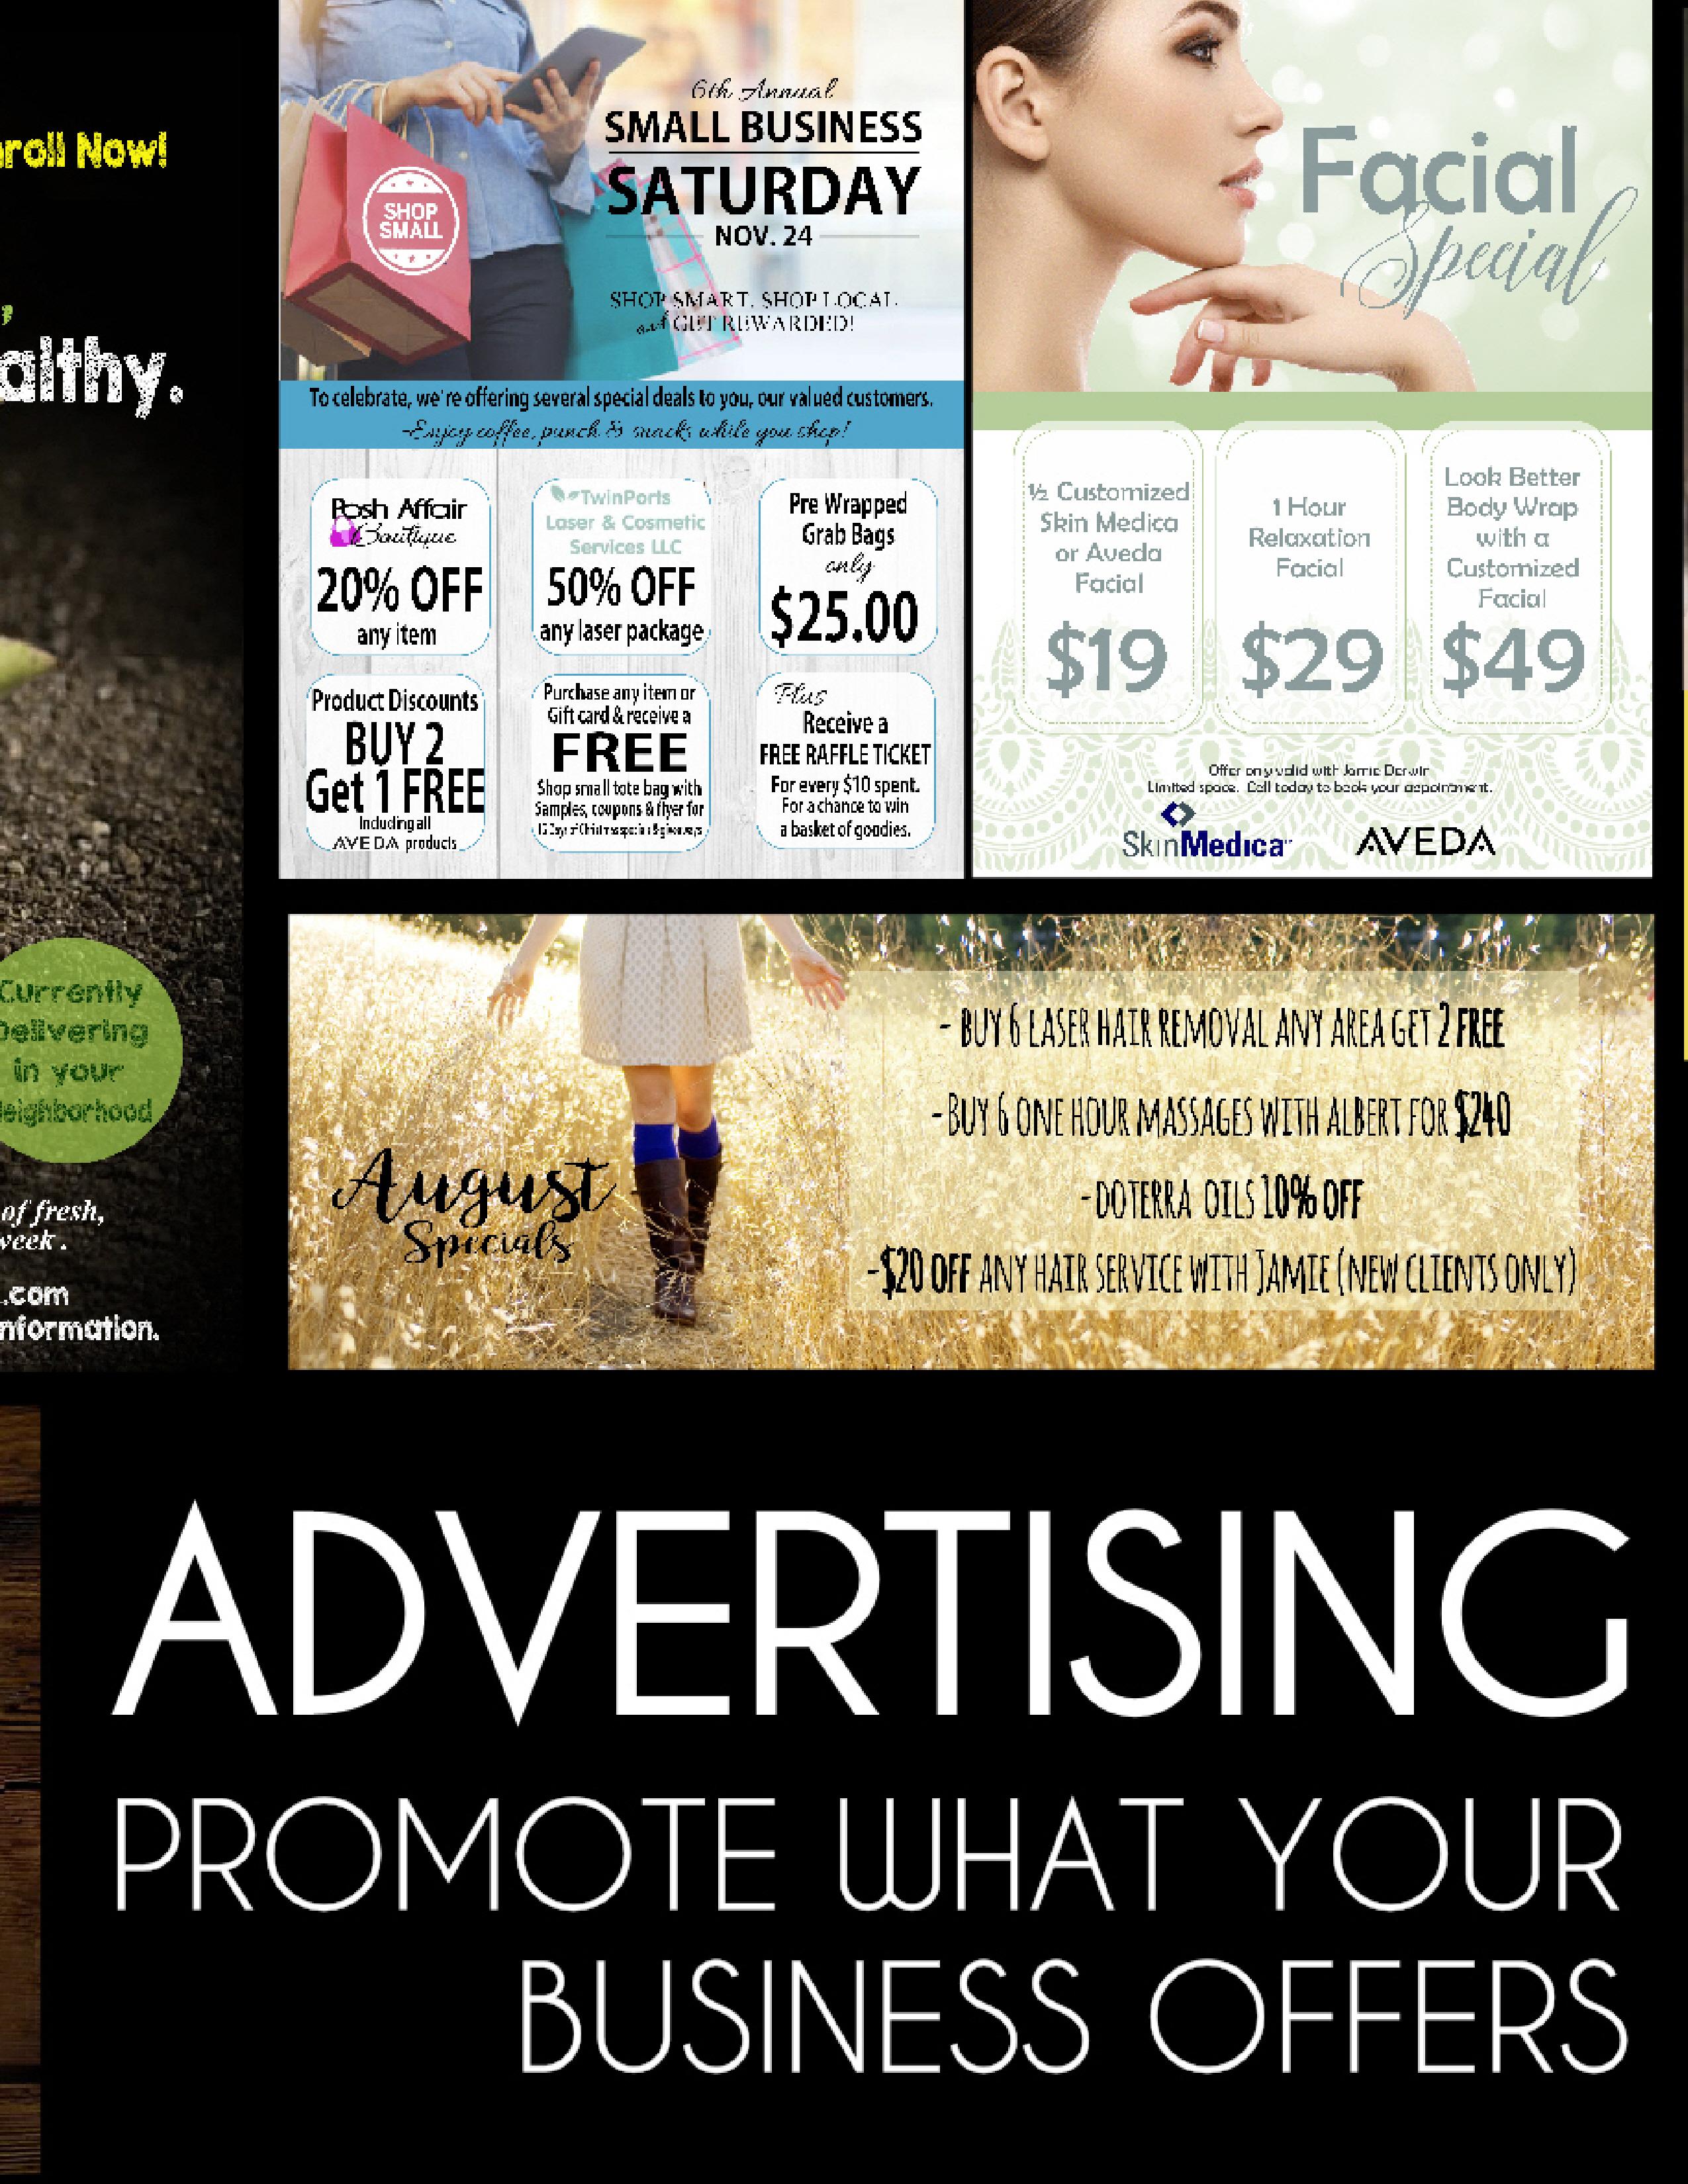 KristaLynnDesign Advertising